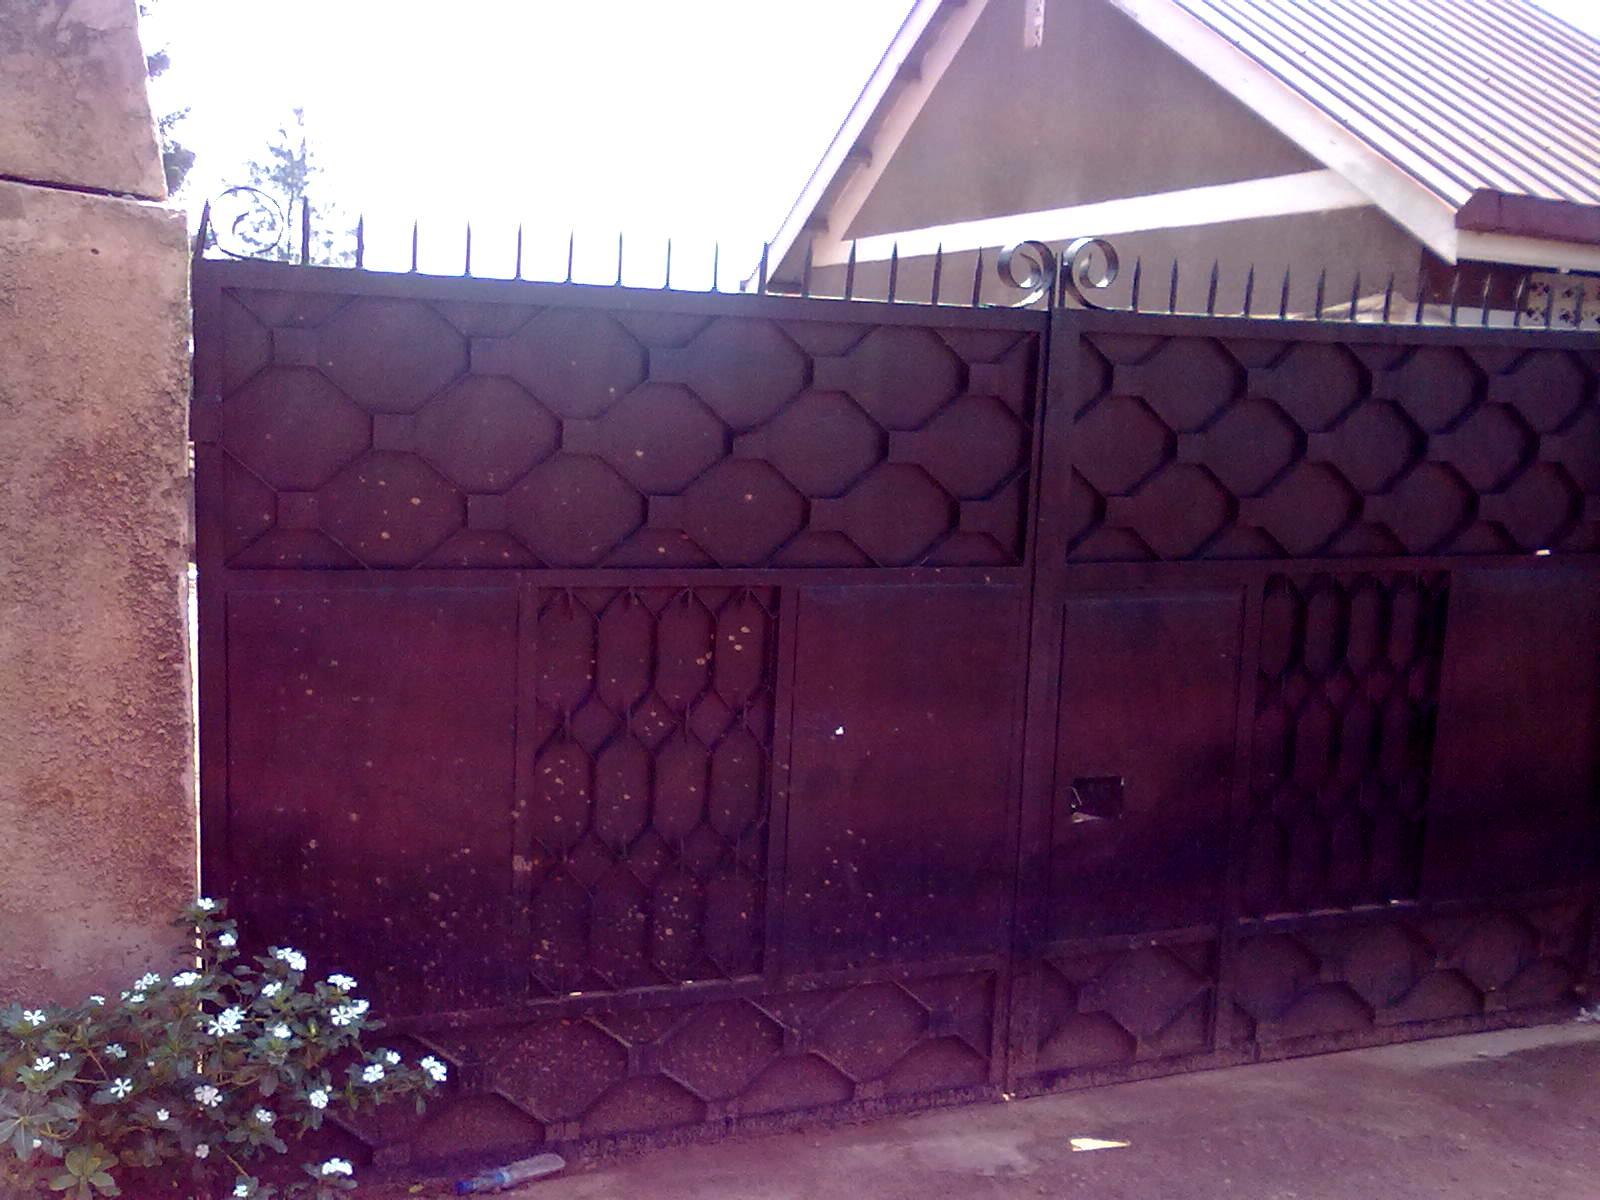 kamwokya - Mawanda Road, Mawanda Road  near kitante medical centre, plot  623, Kampala, East Africa, Uganda